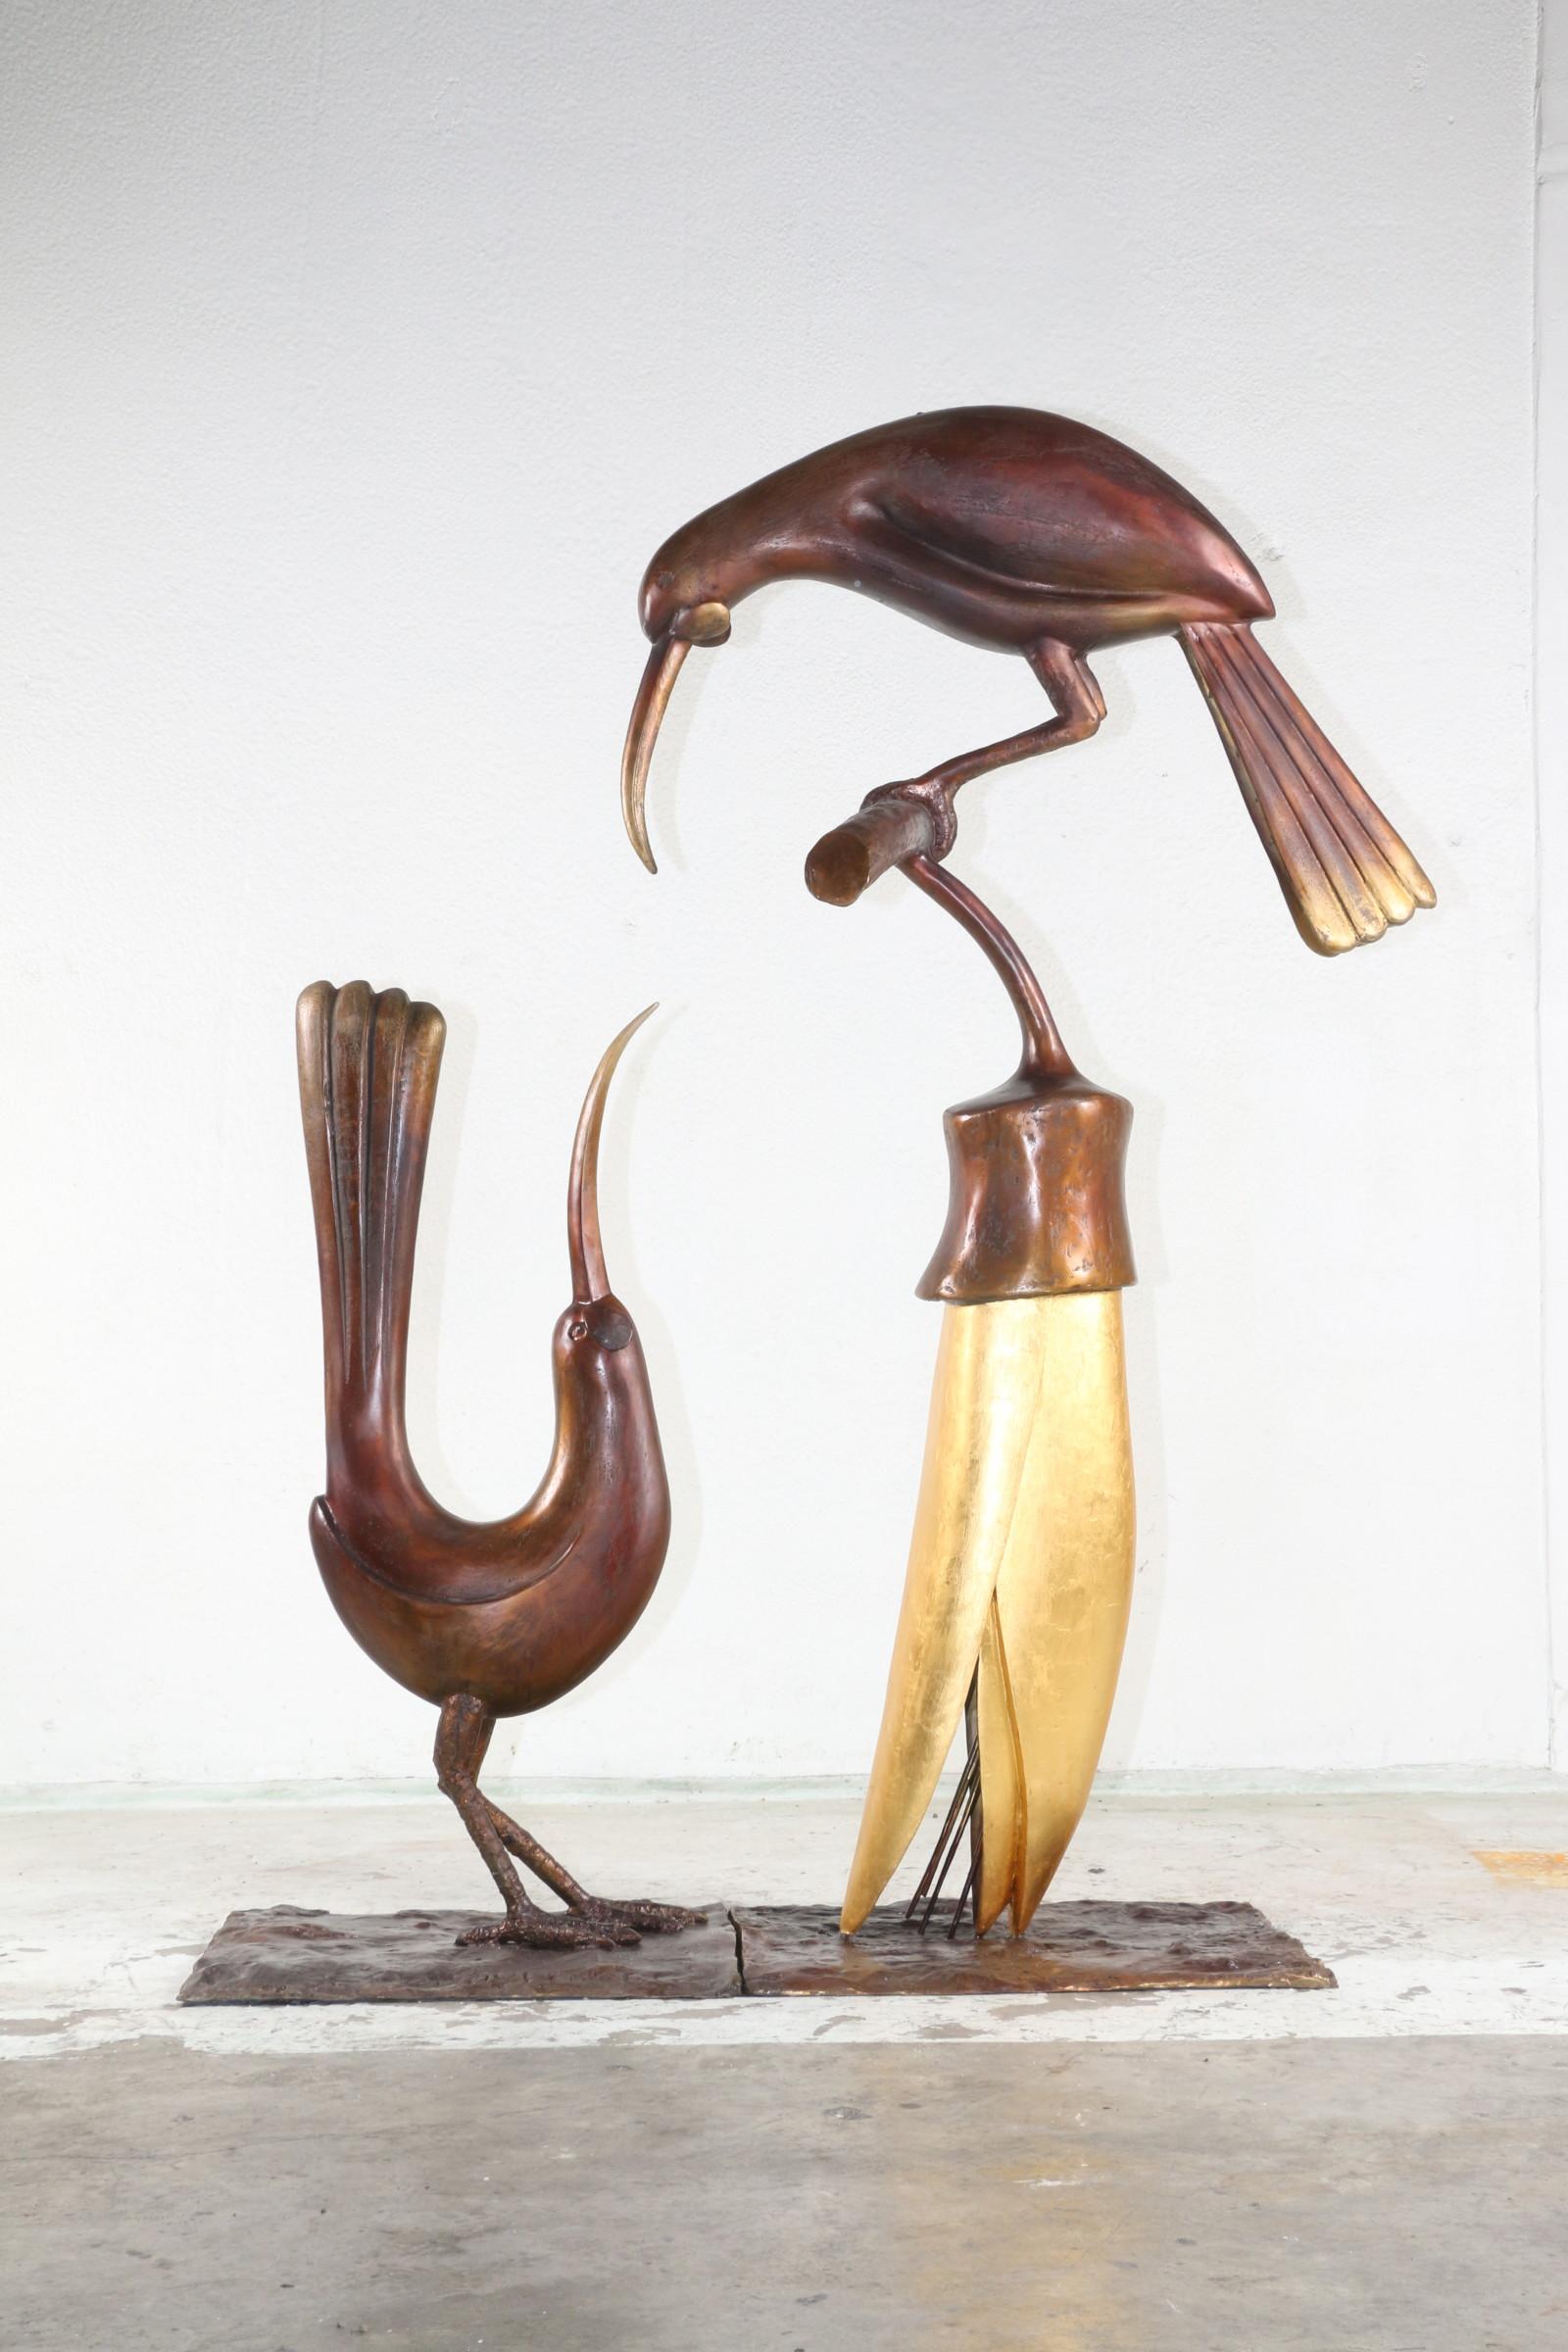 <span class=&#34;link fancybox-details-link&#34;><a href=&#34;/exhibitions/14/works/artworks7179/&#34;>View Detail Page</a></span><div class=&#34;medium&#34;>Cast bronze and 24kt gold</div> <div class=&#34;dimensions&#34;>88.2 x 72.8 x 23.6 in<br />224 x 185 x 60 cm</div> <div class=&#34;edition_details&#34;>#2/2</div>